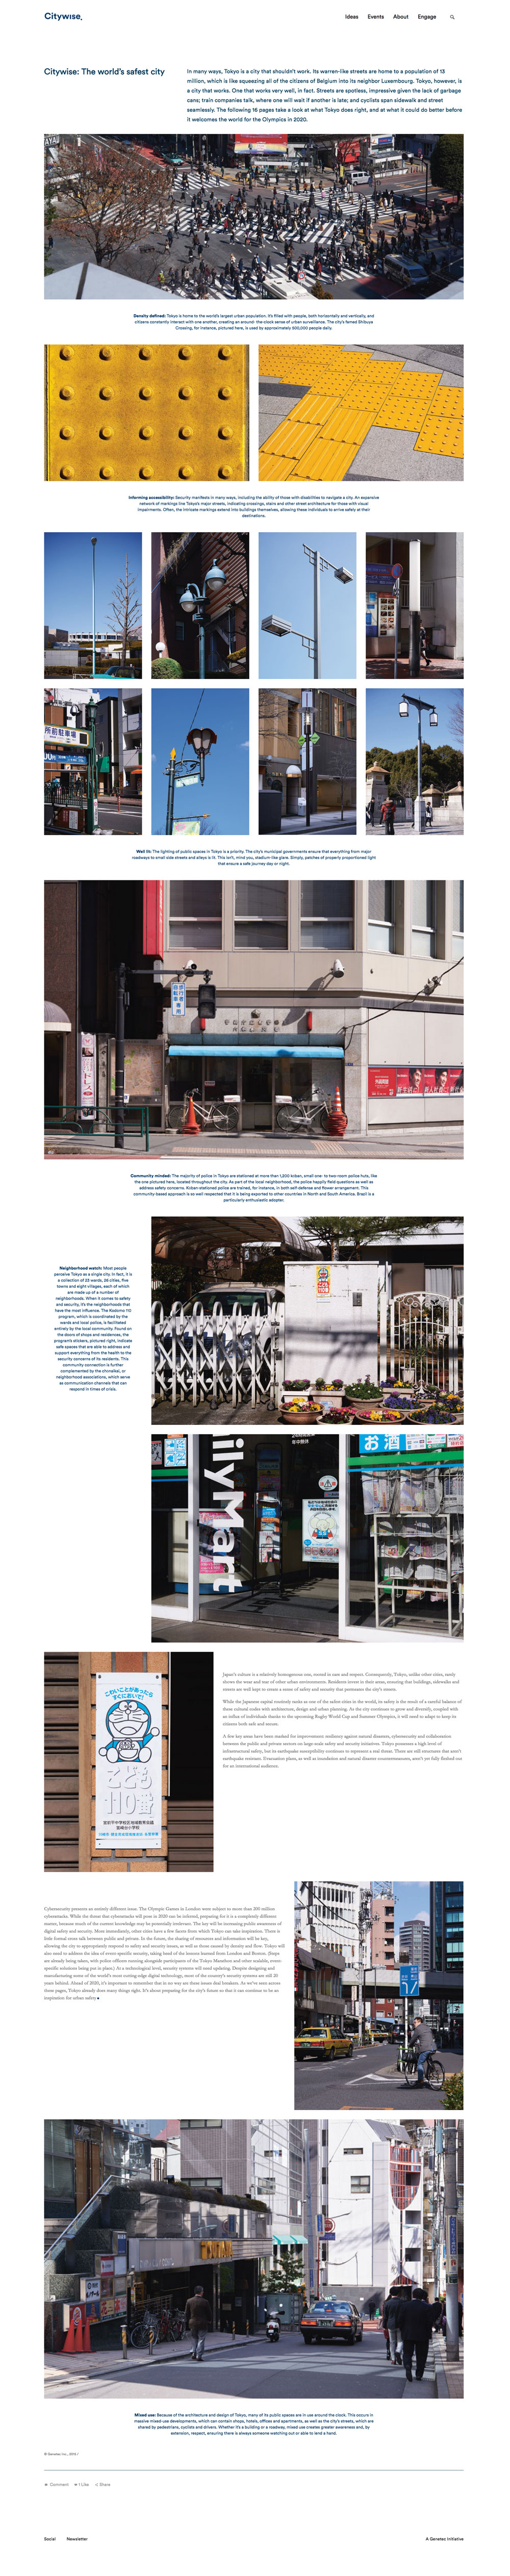 Citywise-3.jpg